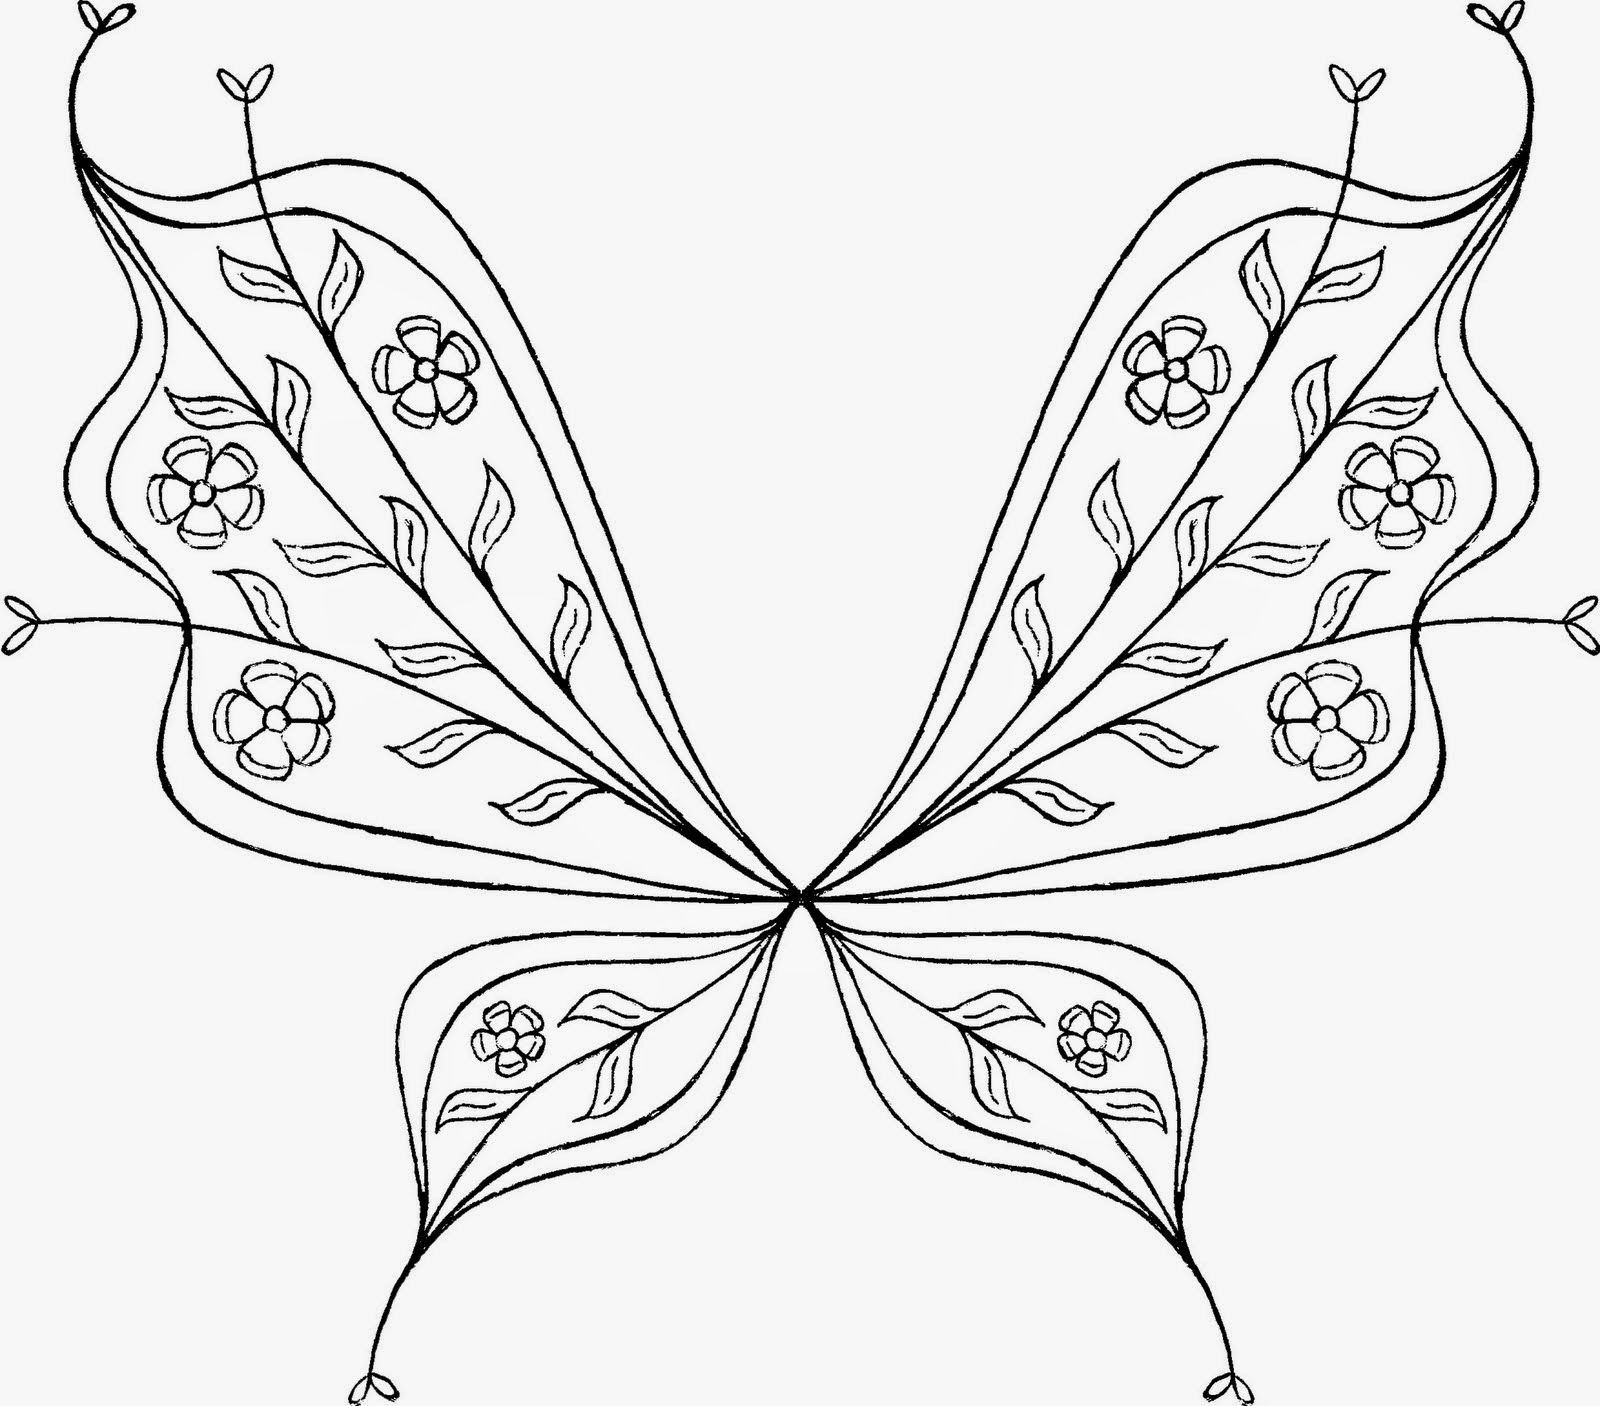 Pin de Danny M. en Tattoo inspiration   Pinterest